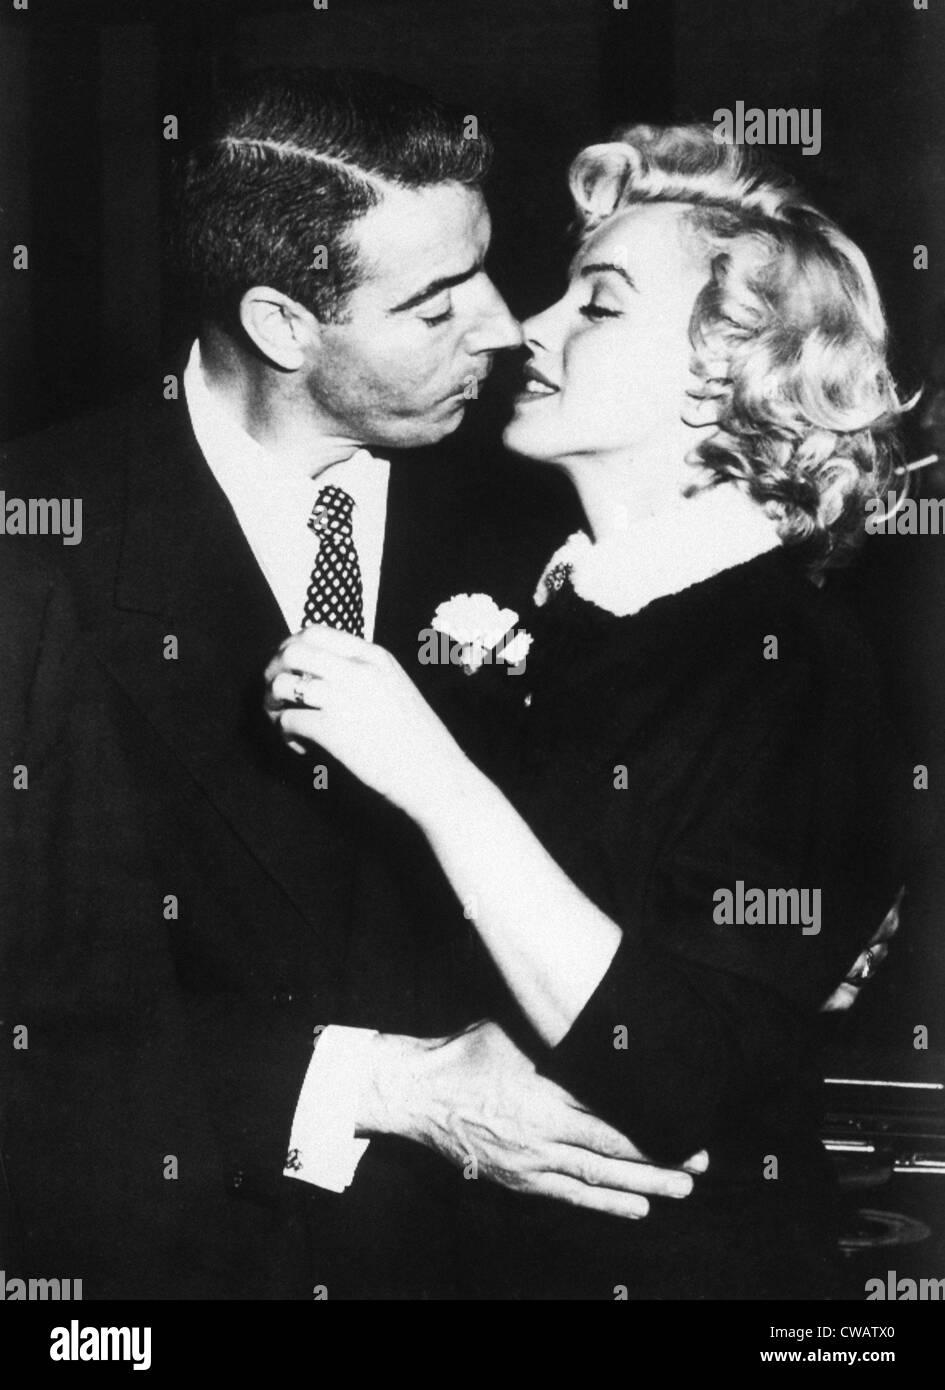 Joe DiMaggio, Marilyn Monroe just after their wedding, 1954 - Stock Image